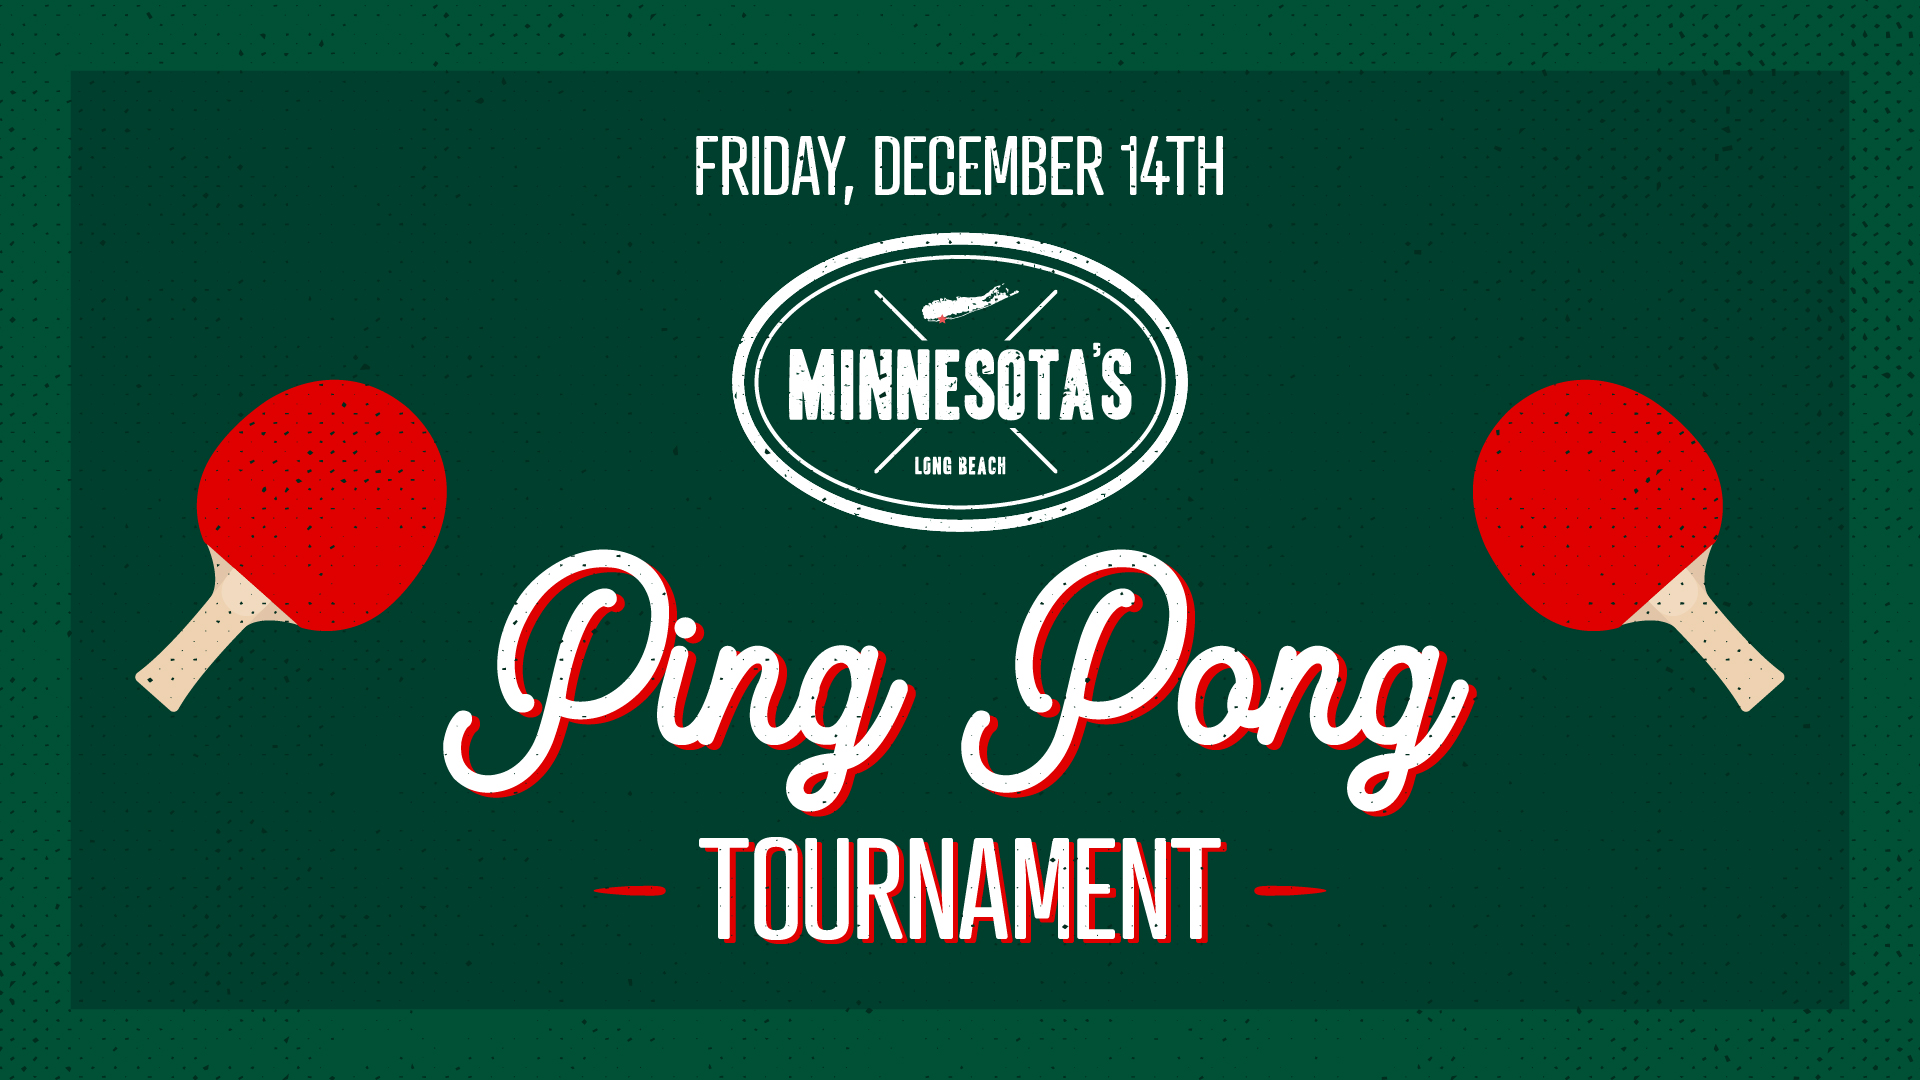 pingpong_event-01.jpg